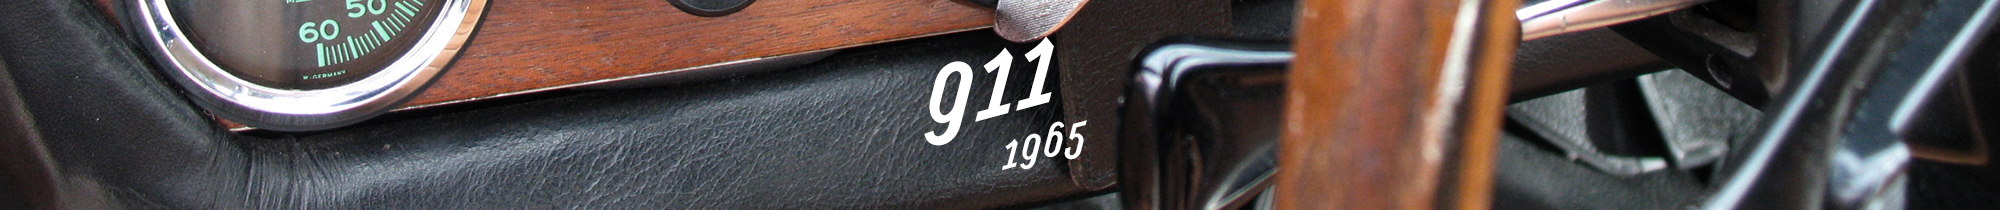 bandeau-ajoutlyford-911serie0-02